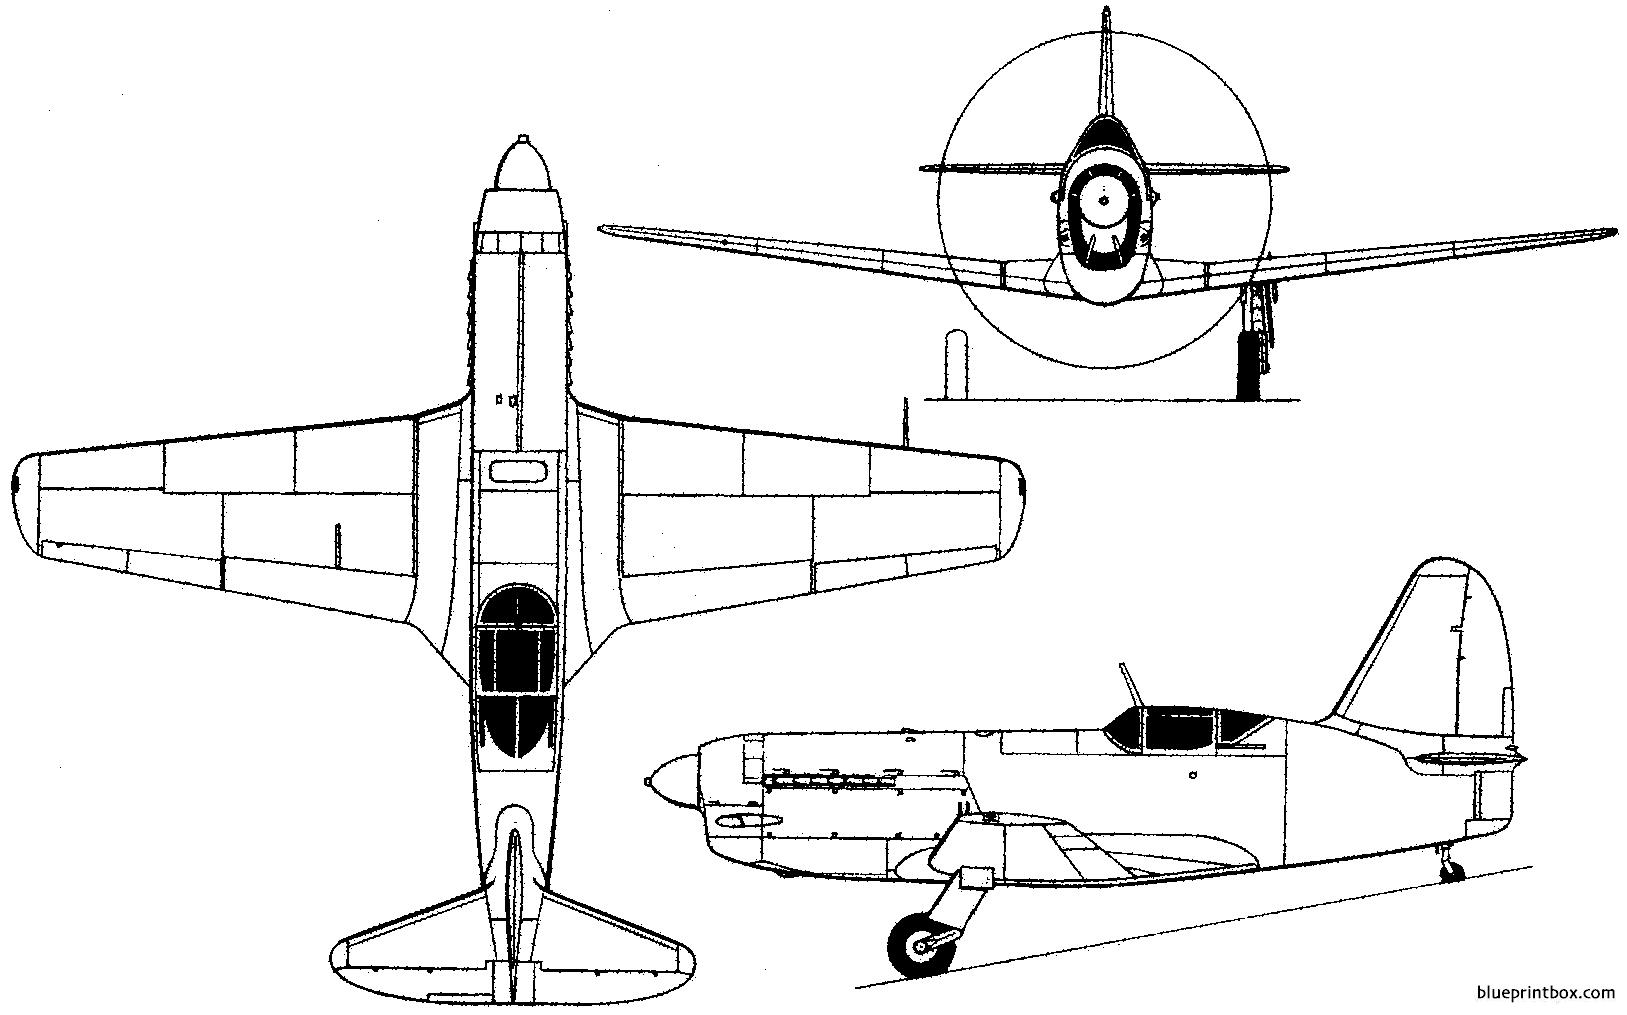 Mikoyan Gurevich Mig 13 I 250 1945 Russia